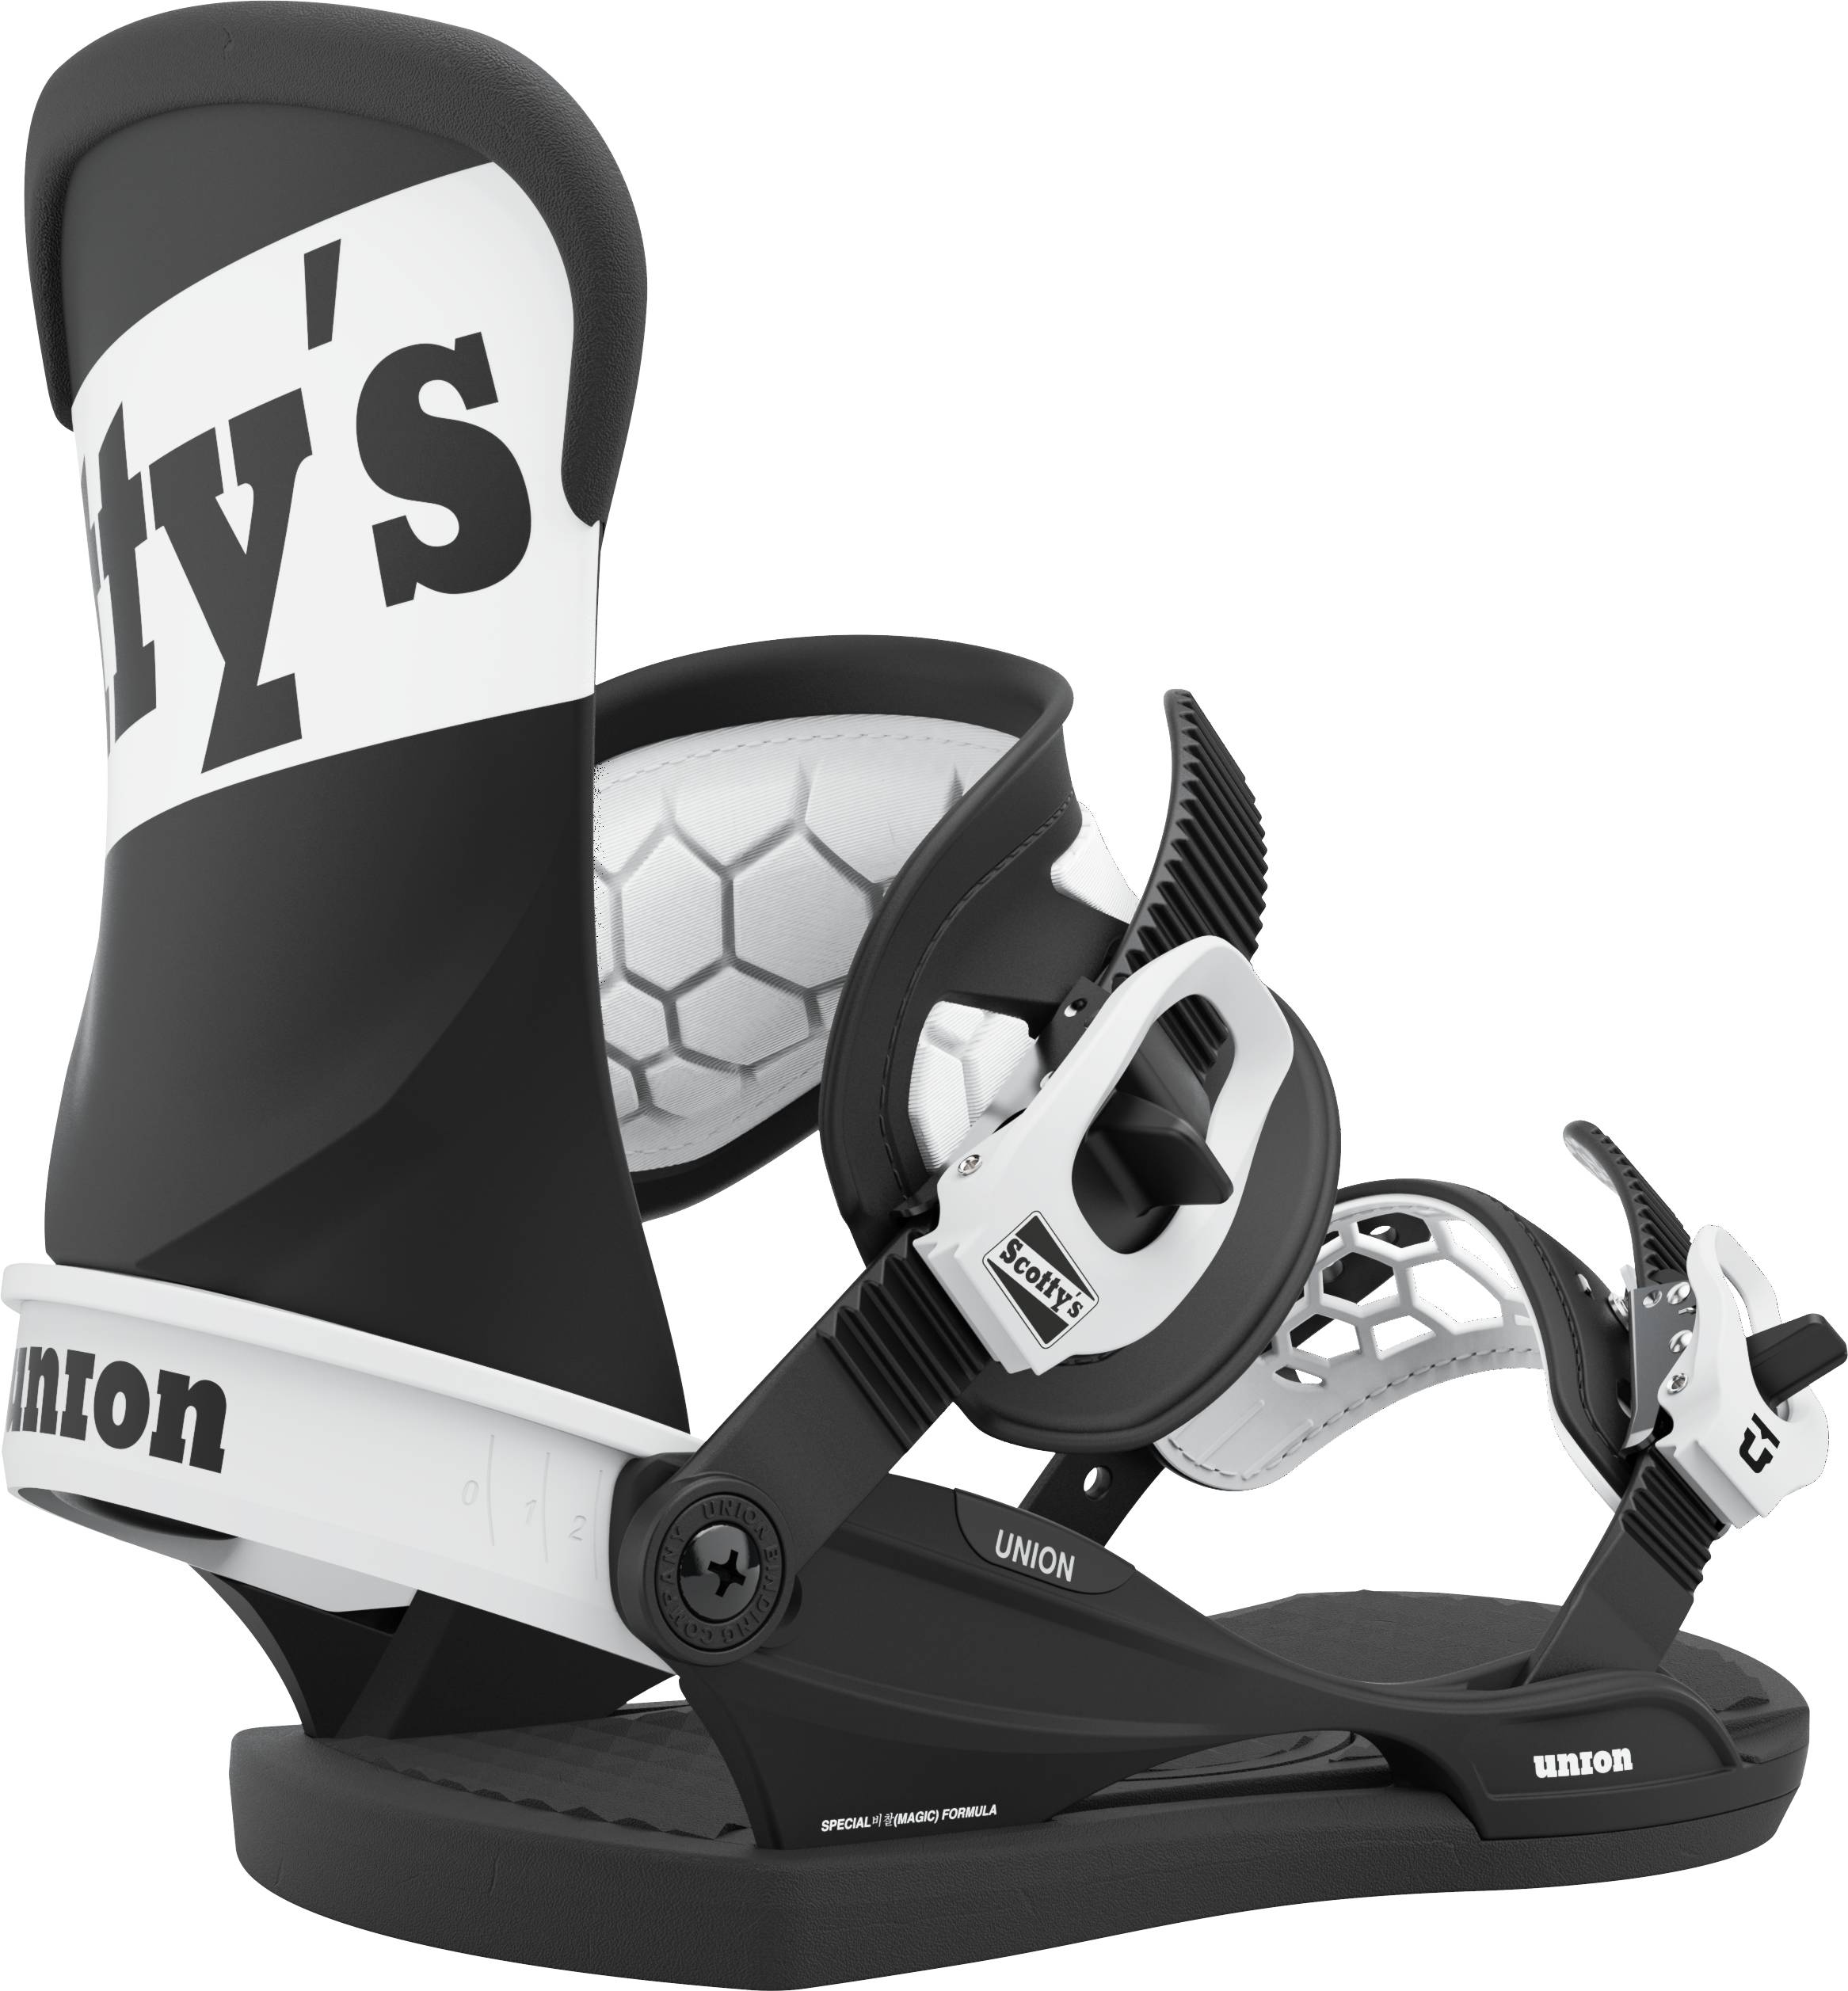 Union Contact Pro Scott Stevens Pro Snowboard Bindings L Scotty